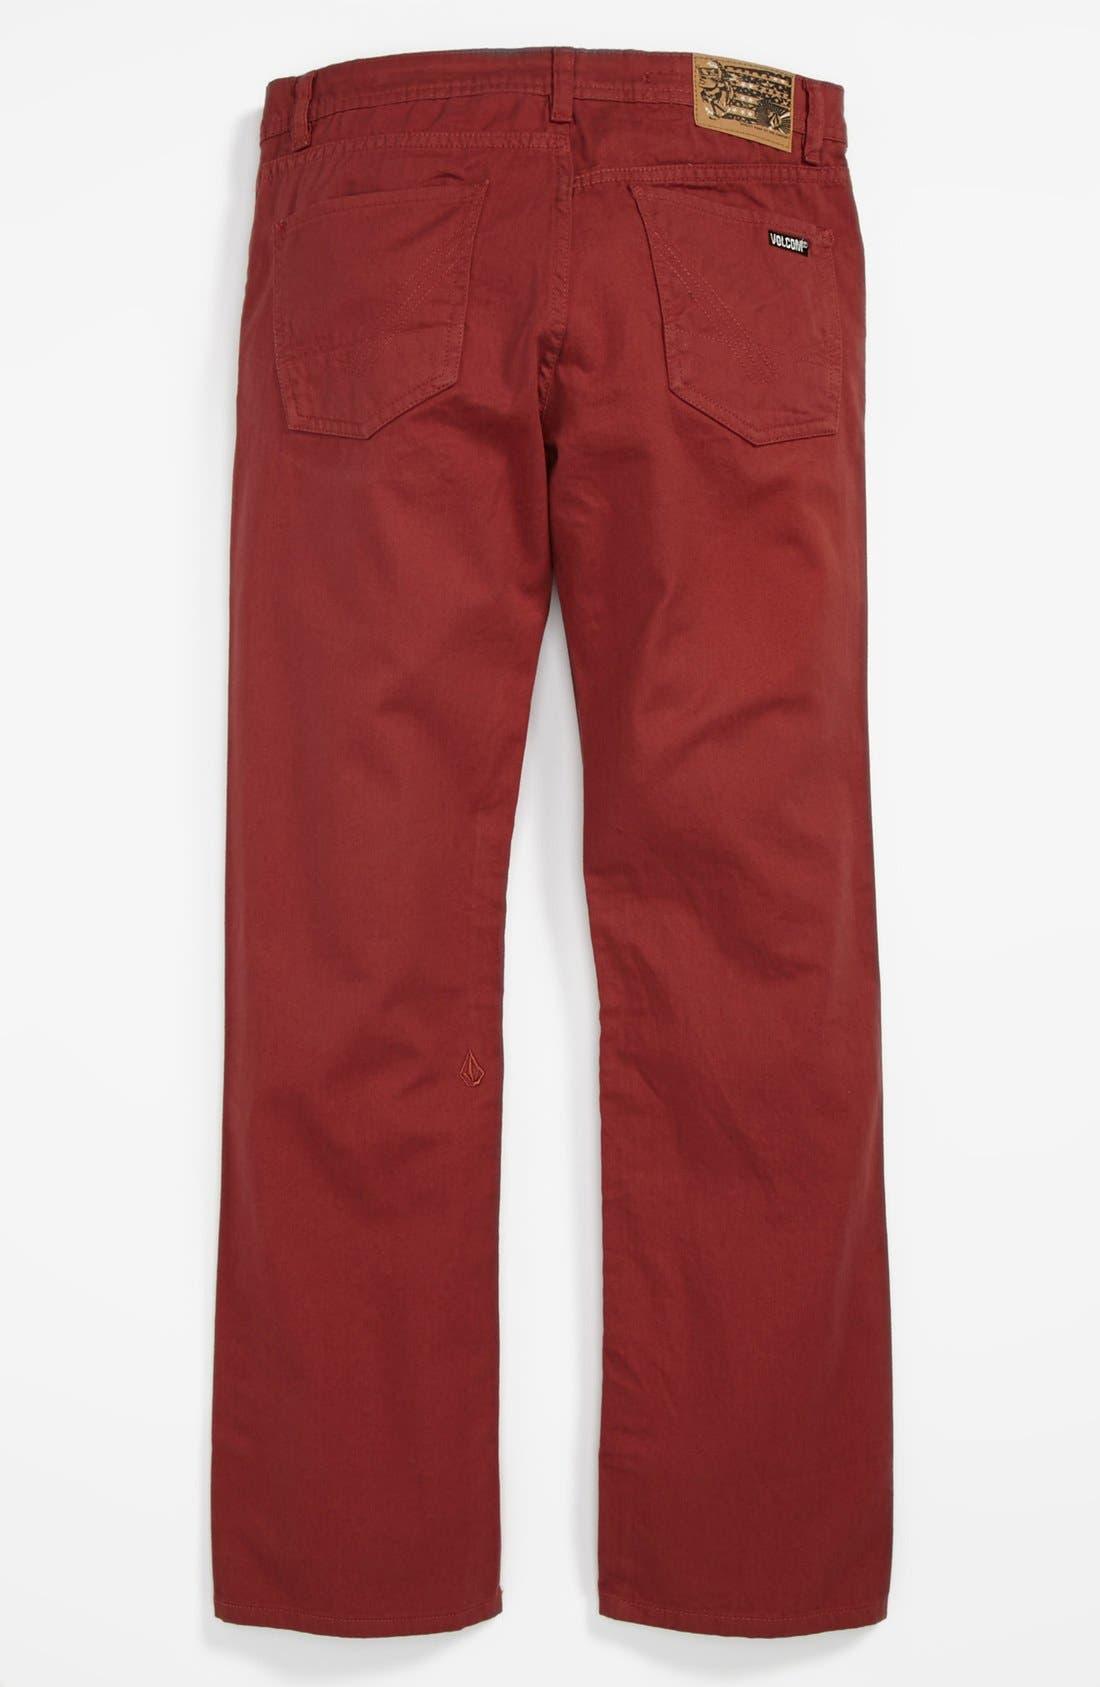 Alternate Image 1 Selected - Volcom 'Vorta' Twill Pants (Little Boys)